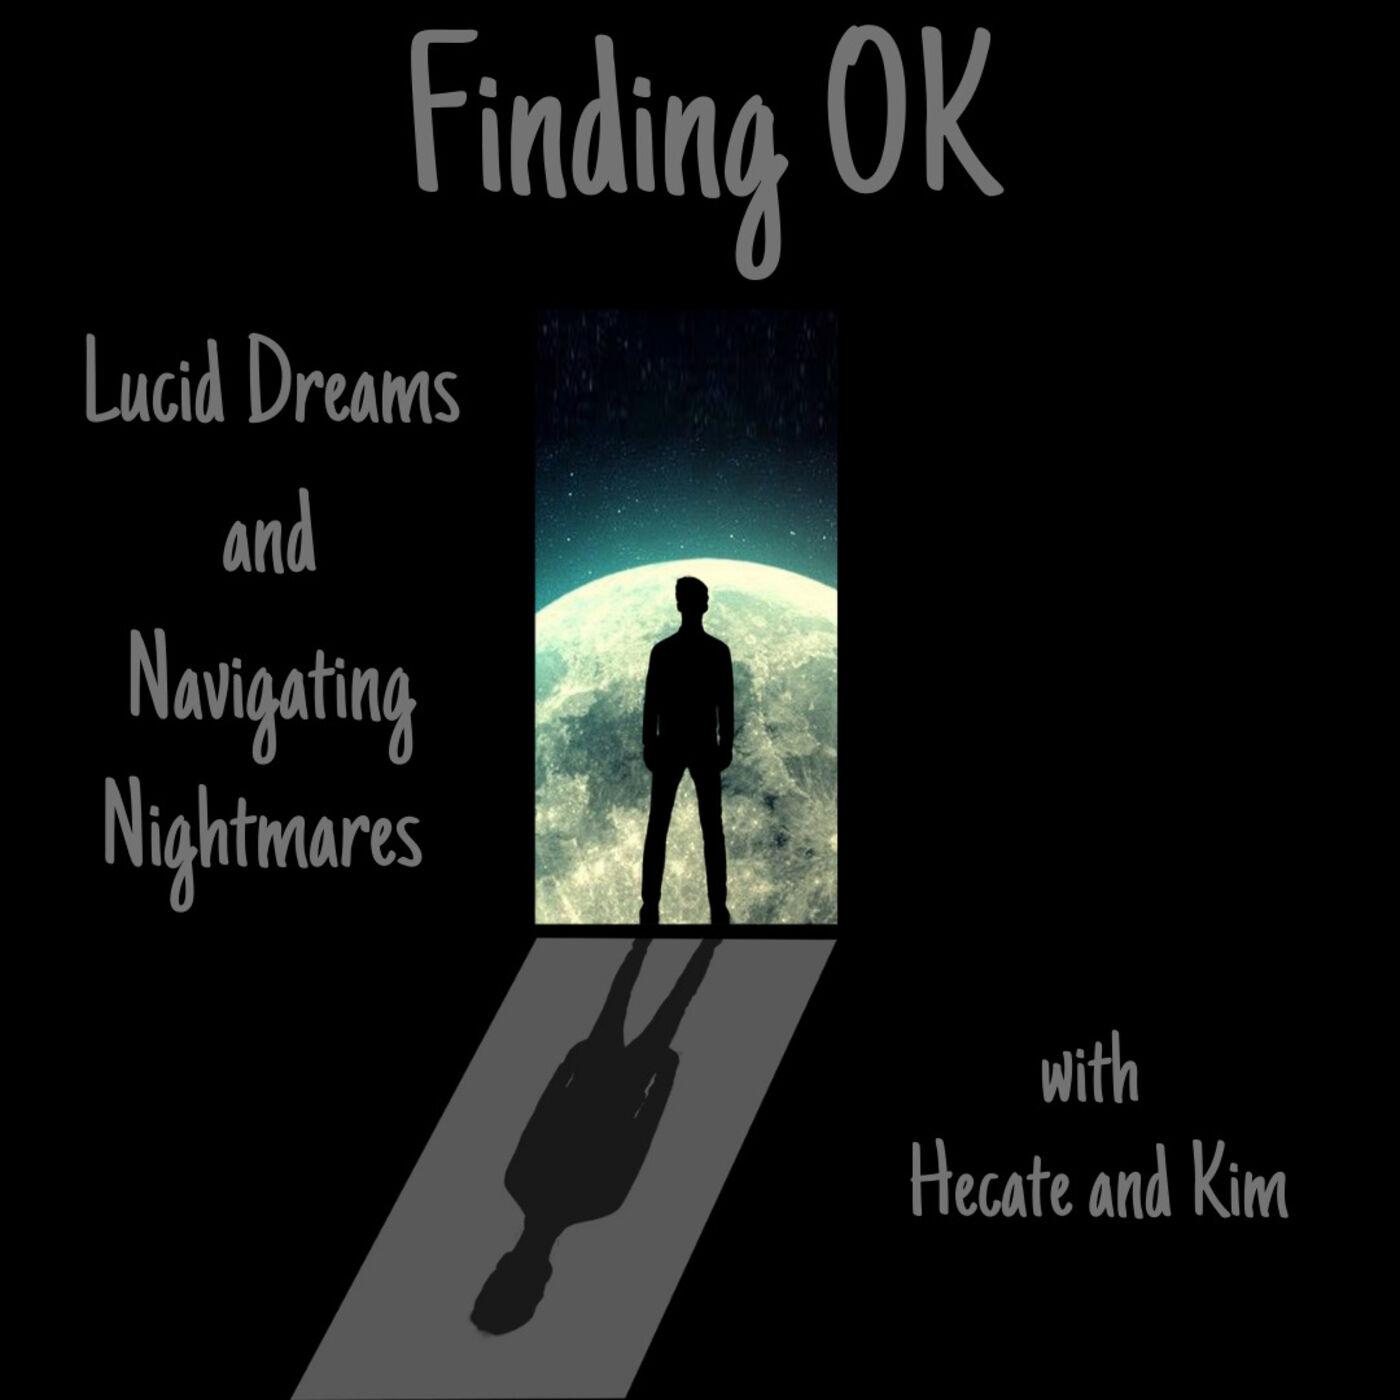 Lucid Dreams and Navigating Nightmares